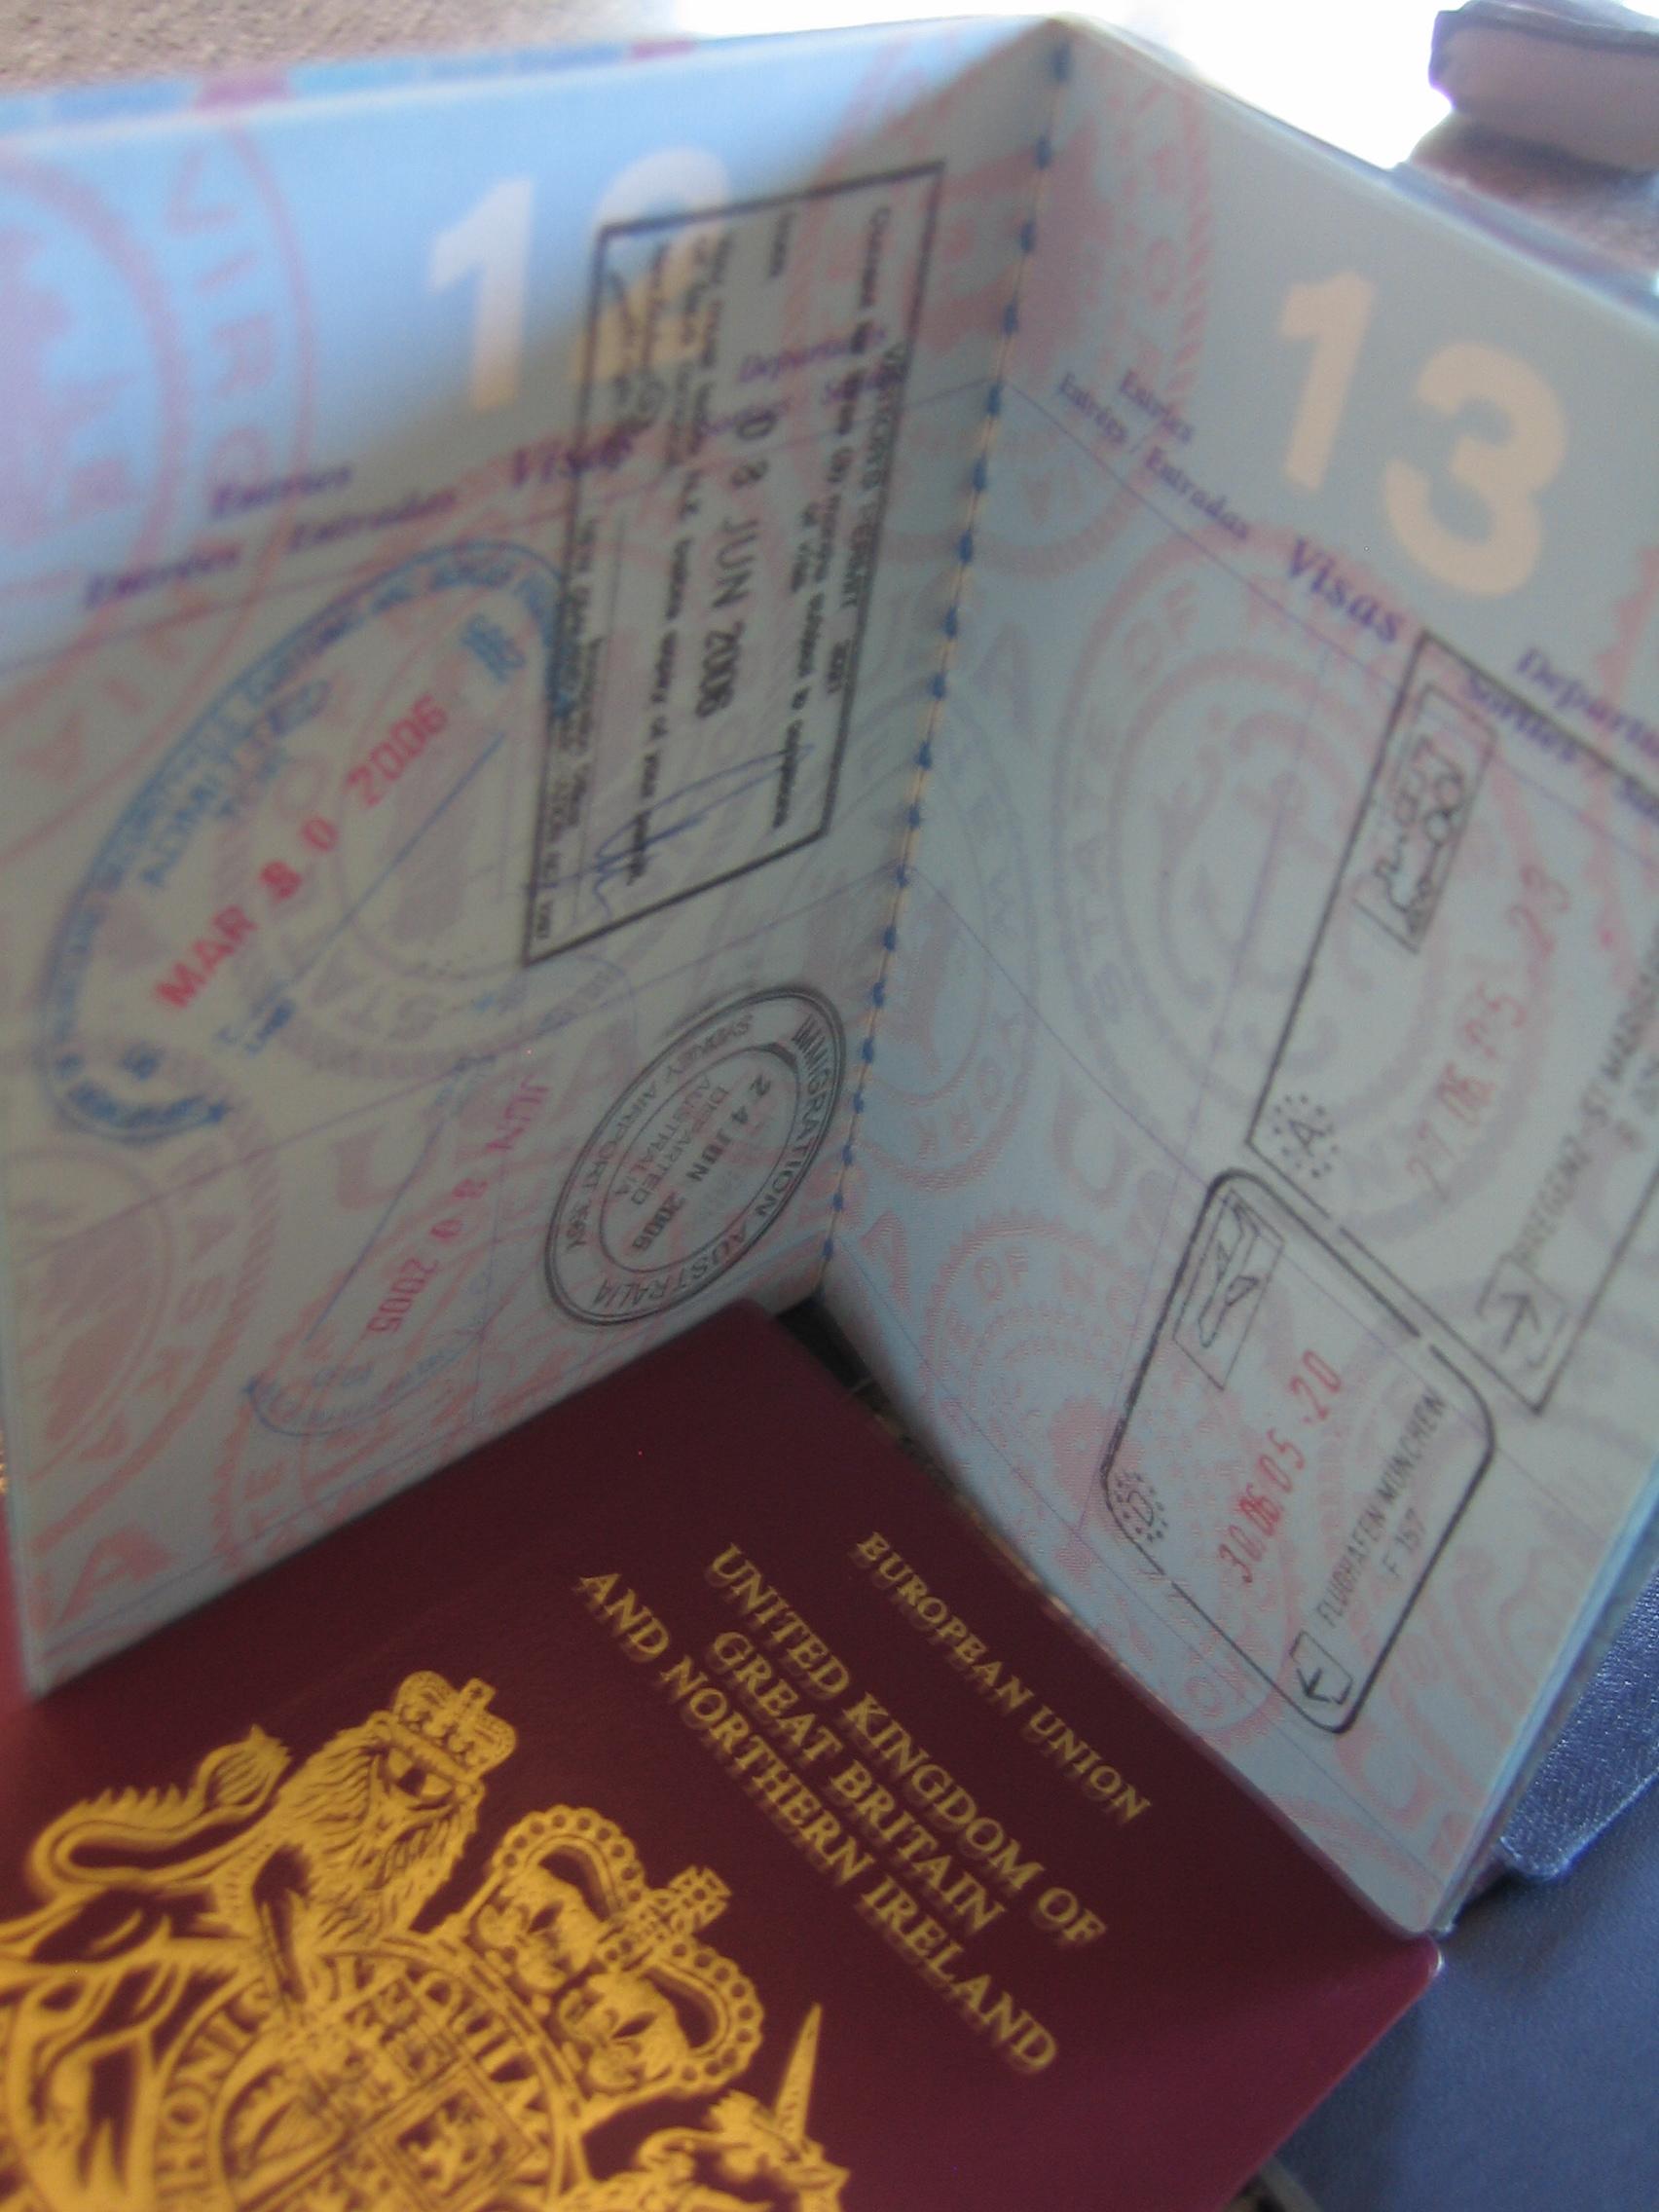 image The passport predicament a spanking punishment